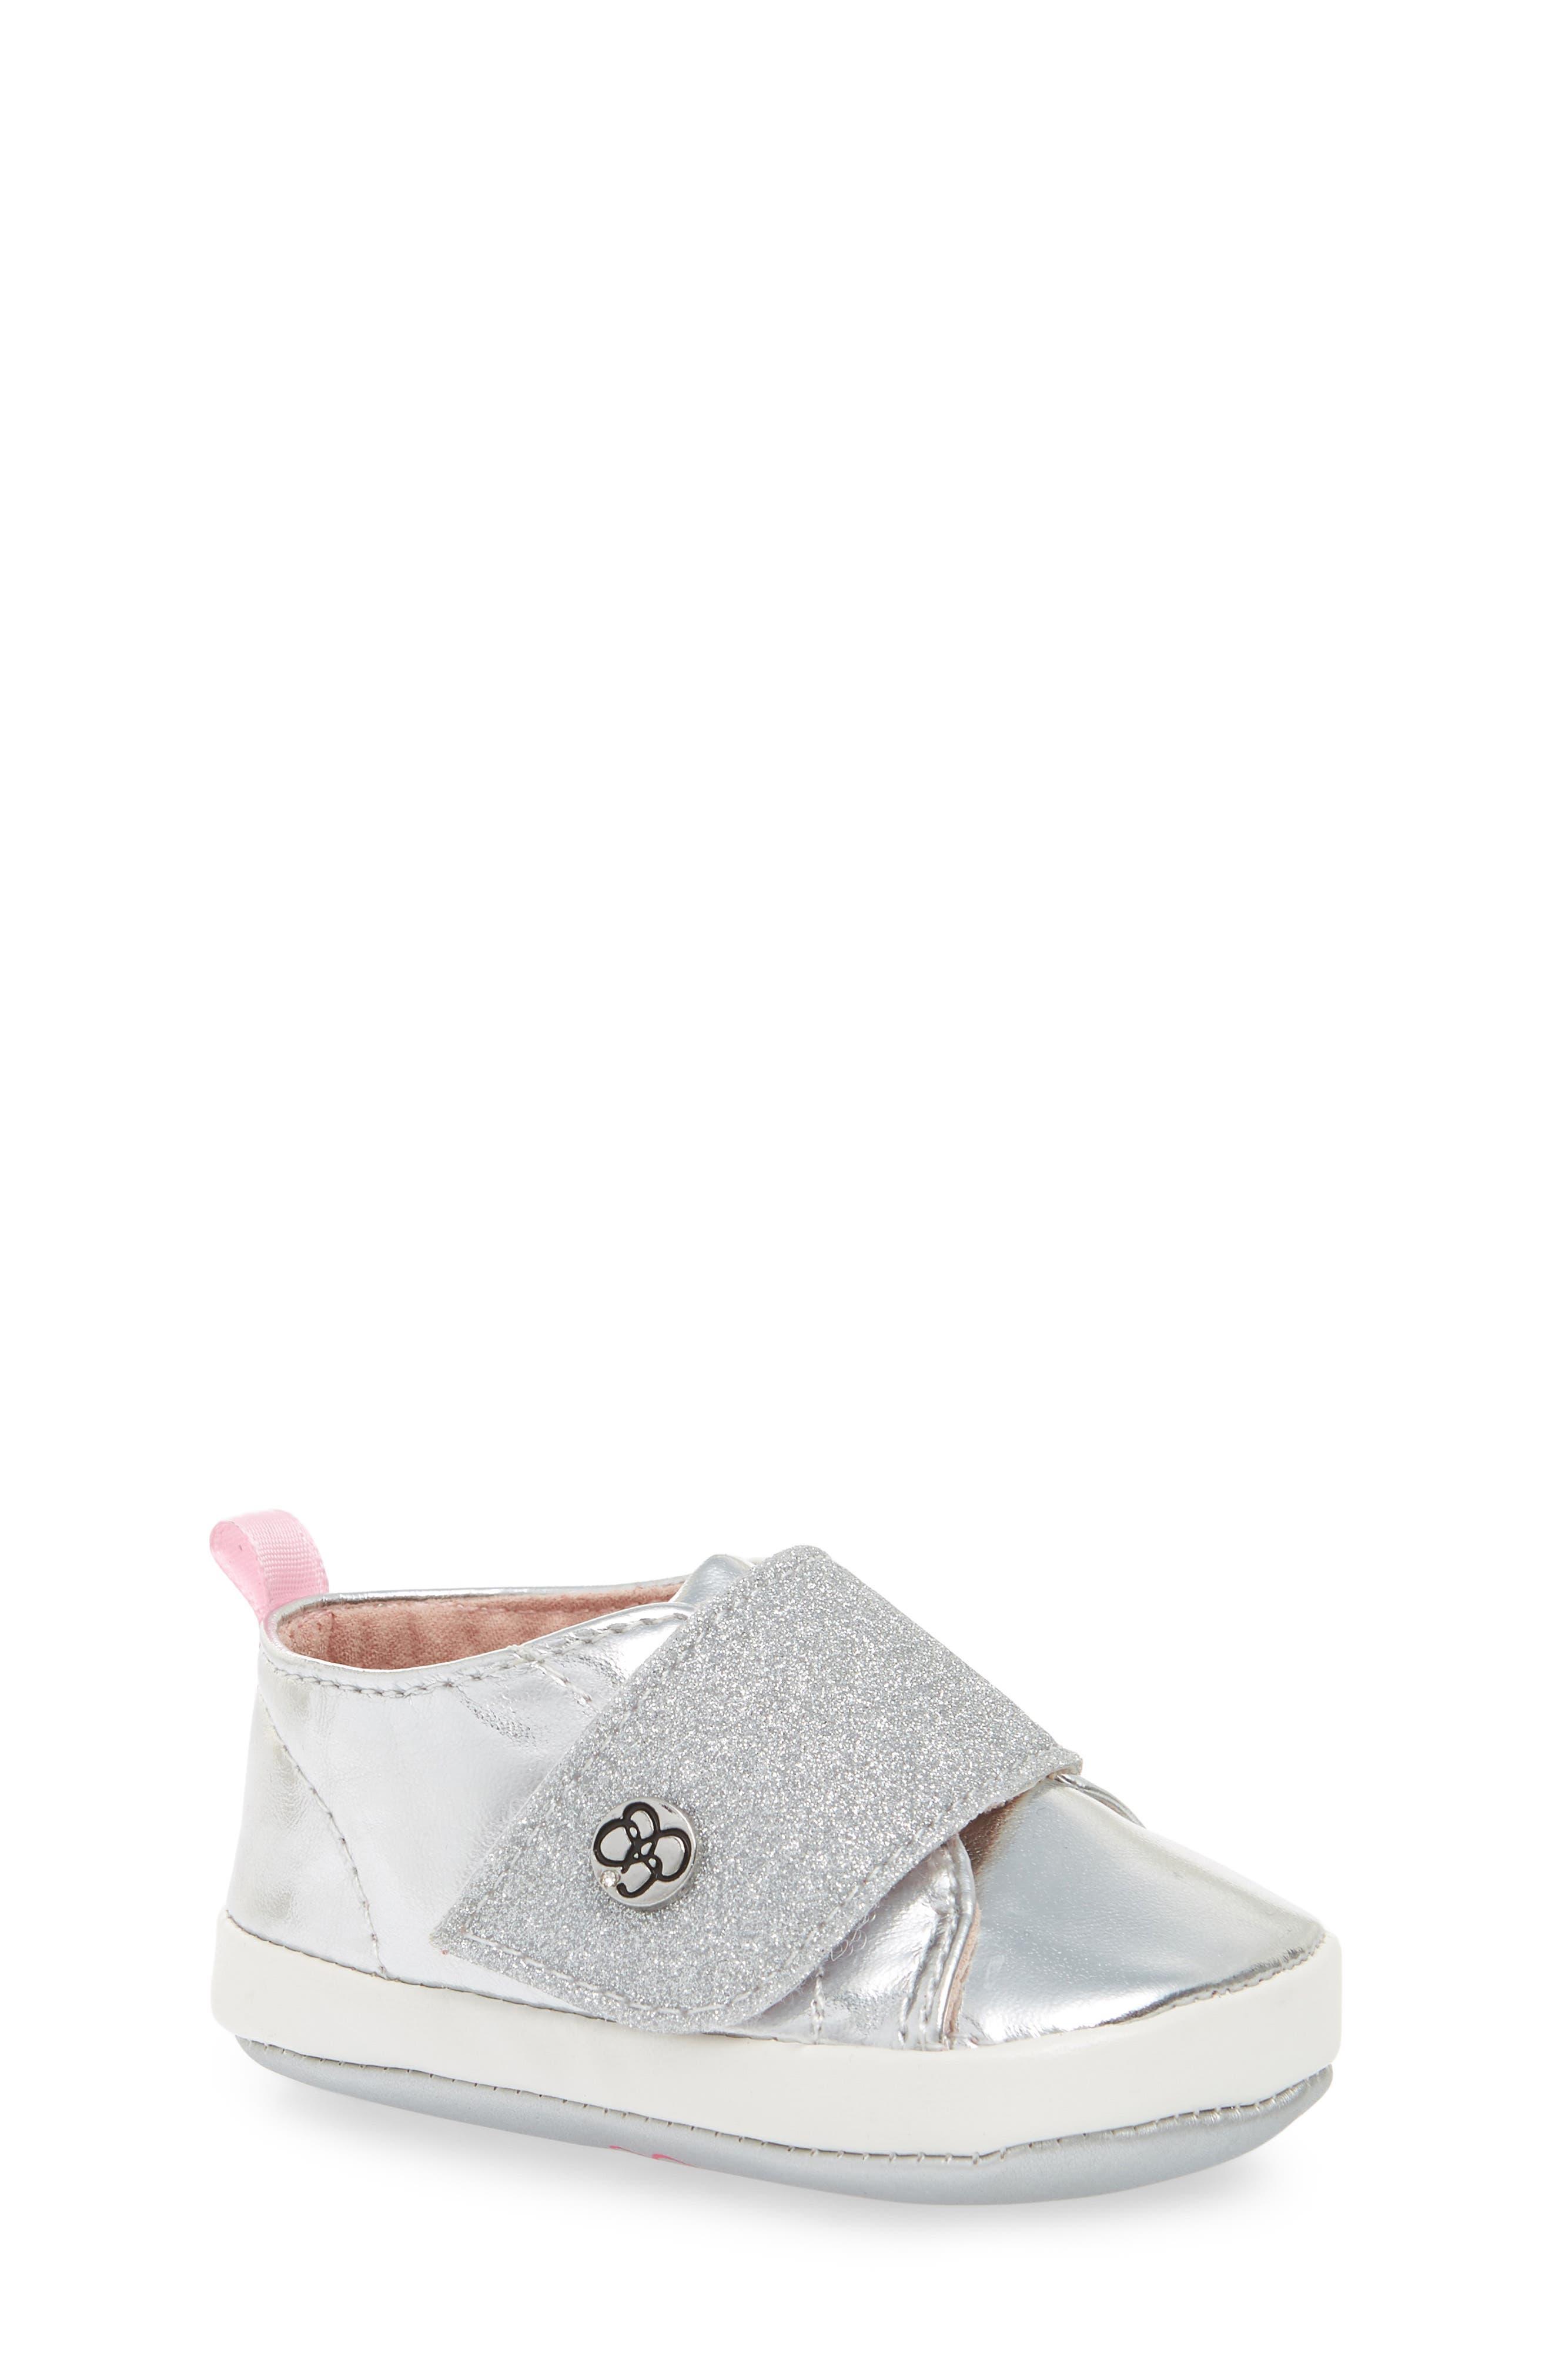 JESSICA SIMPSON,                             Glitter Crib Sneaker,                             Main thumbnail 1, color,                             040